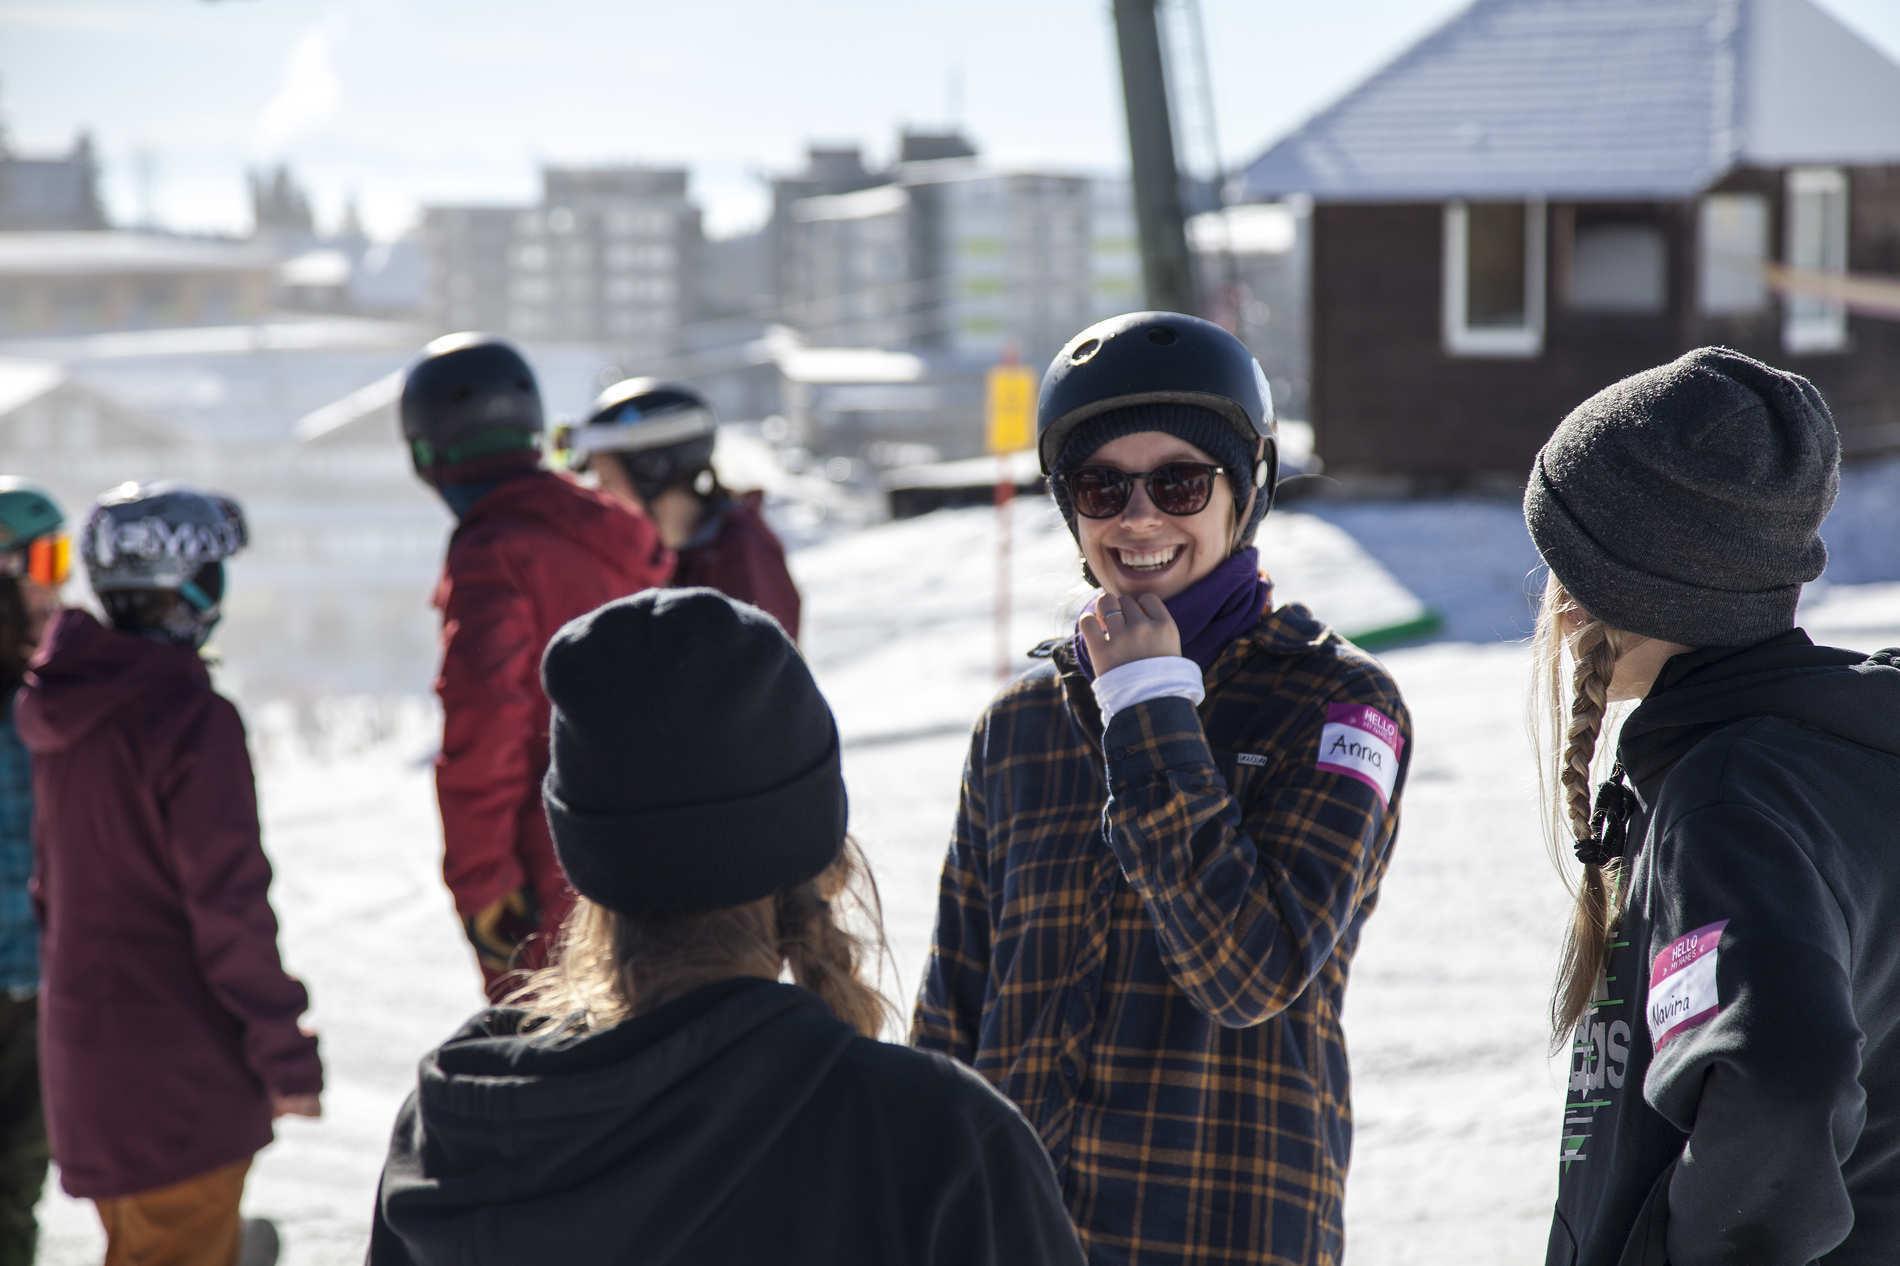 web snowpark feldberg 25 02 2017 lifestyle fs sb martin herrmann qparks 12